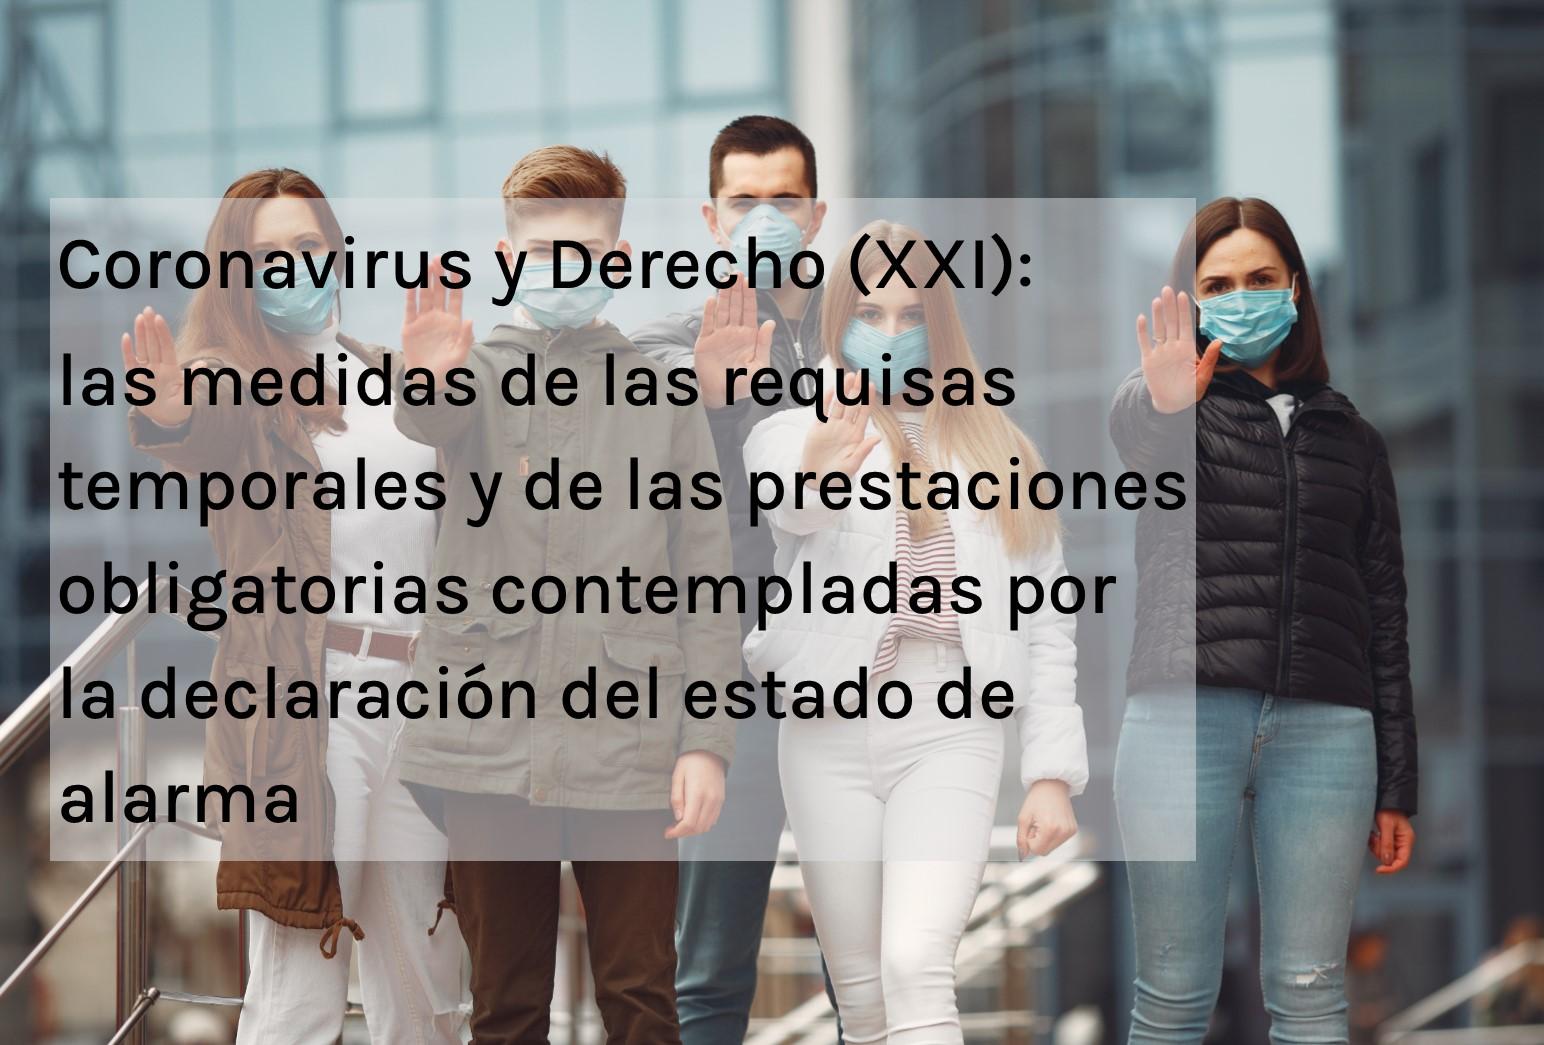 Coronavirus y Derecho XXI